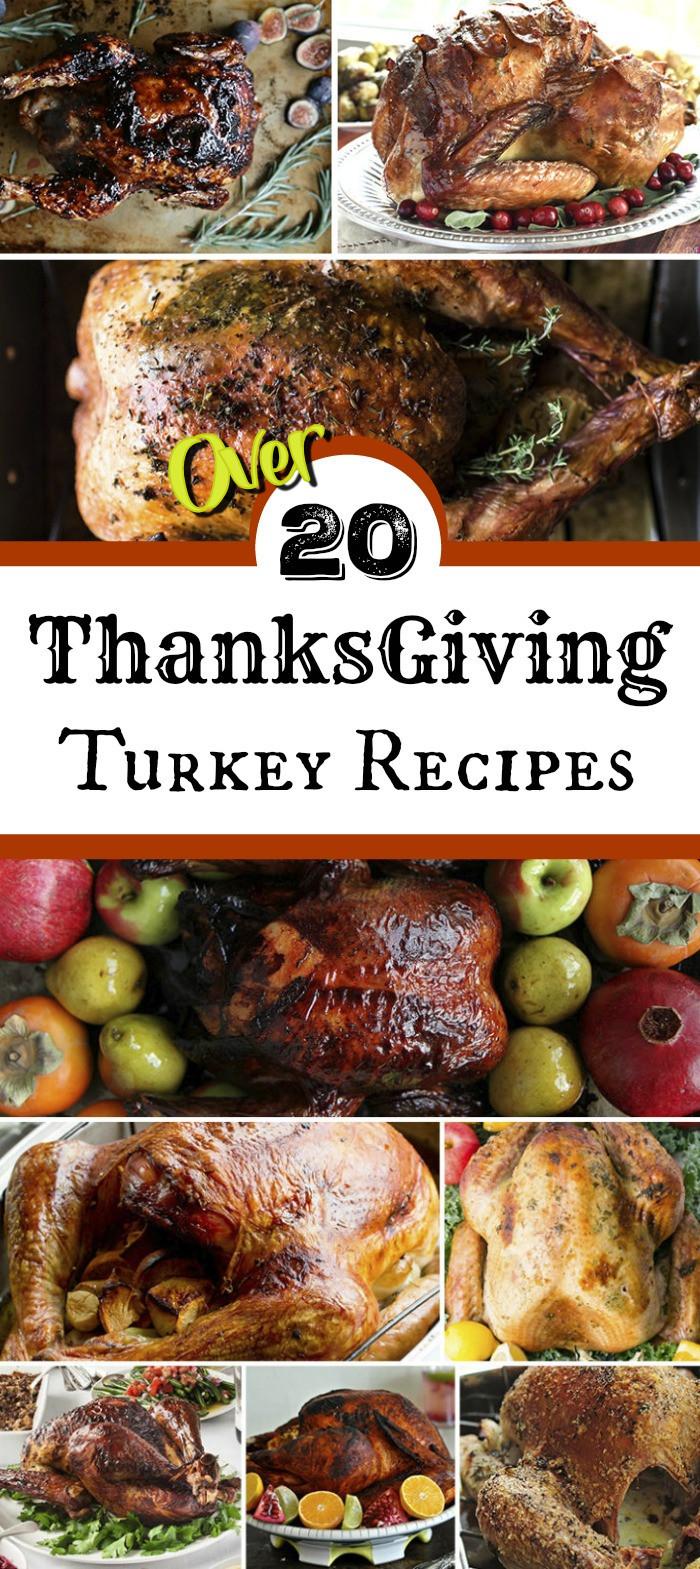 Best Turkey Recipe Thanksgiving  Thanksgiving Turkey Recipes for the Best Thanksgiving